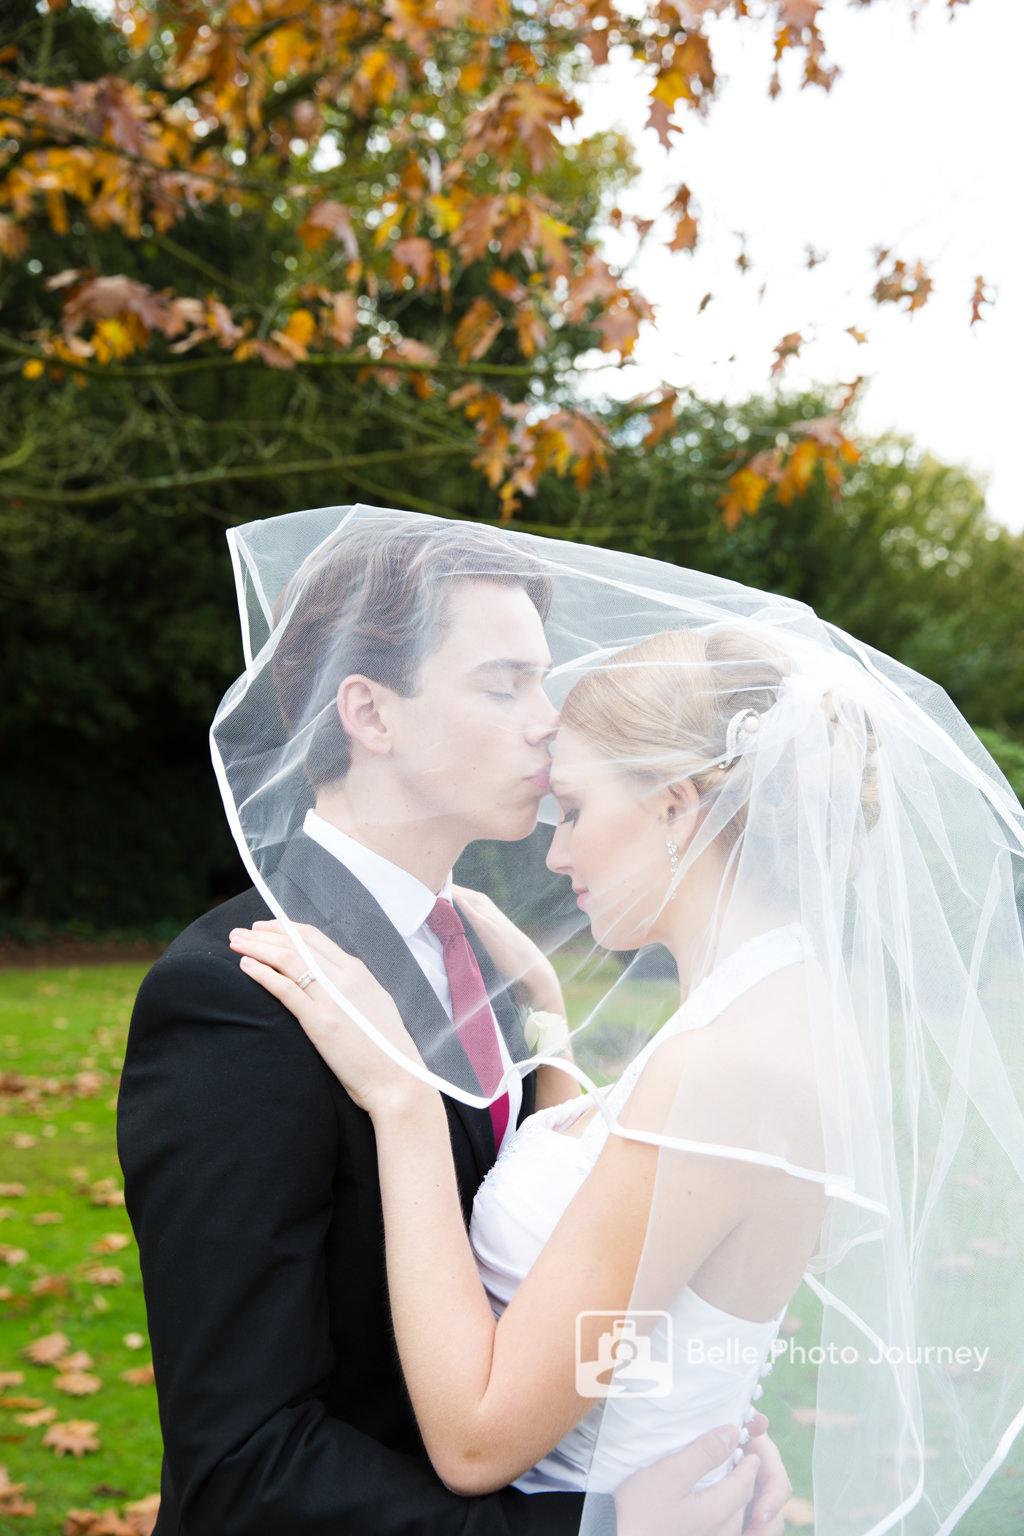 garden wedding portrait autumn bride veil over groom